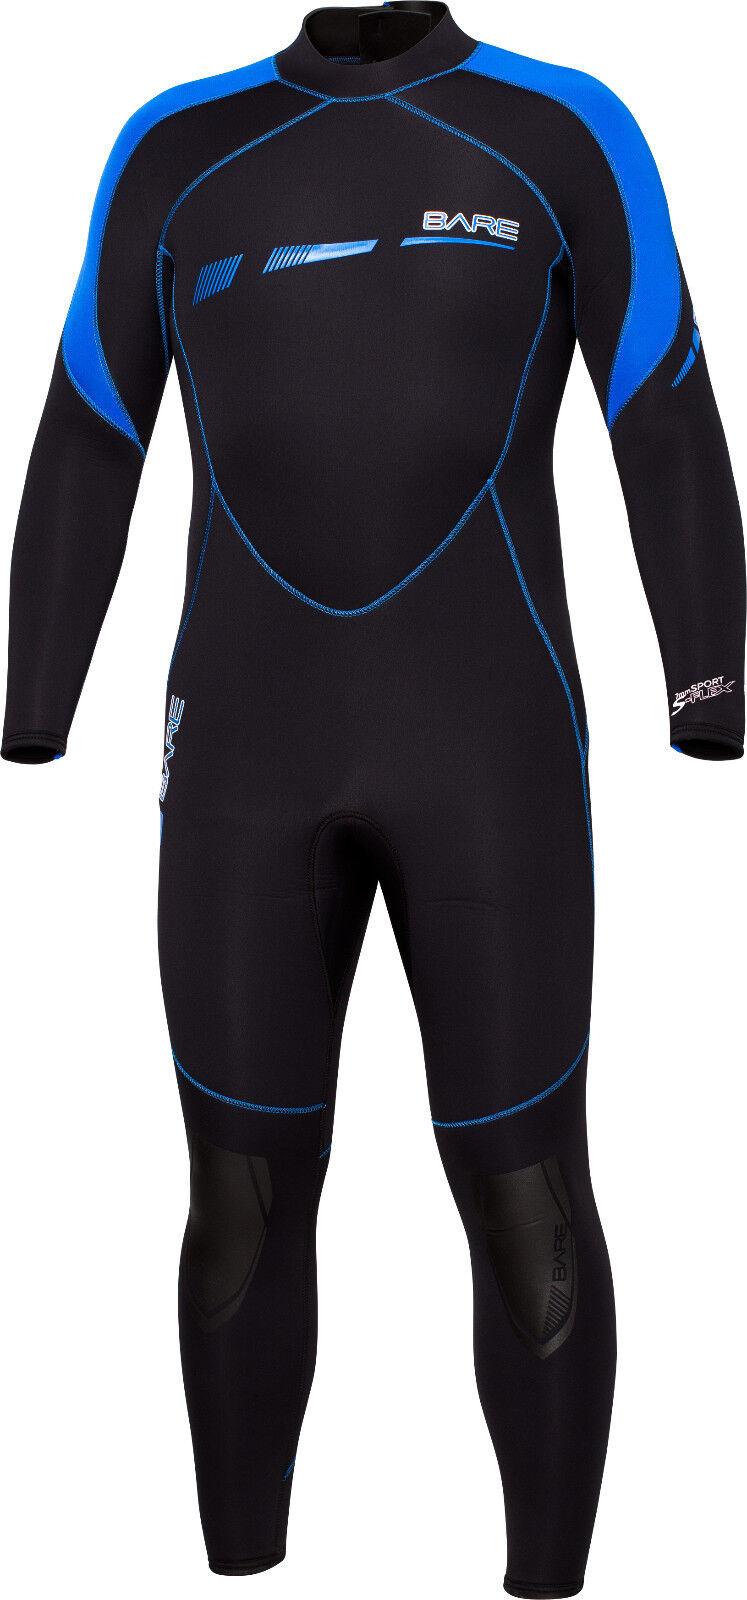 Bare 5mm Sport S-Flex Full Scuba Diving Wetsuit Sie's (Alle Größen)